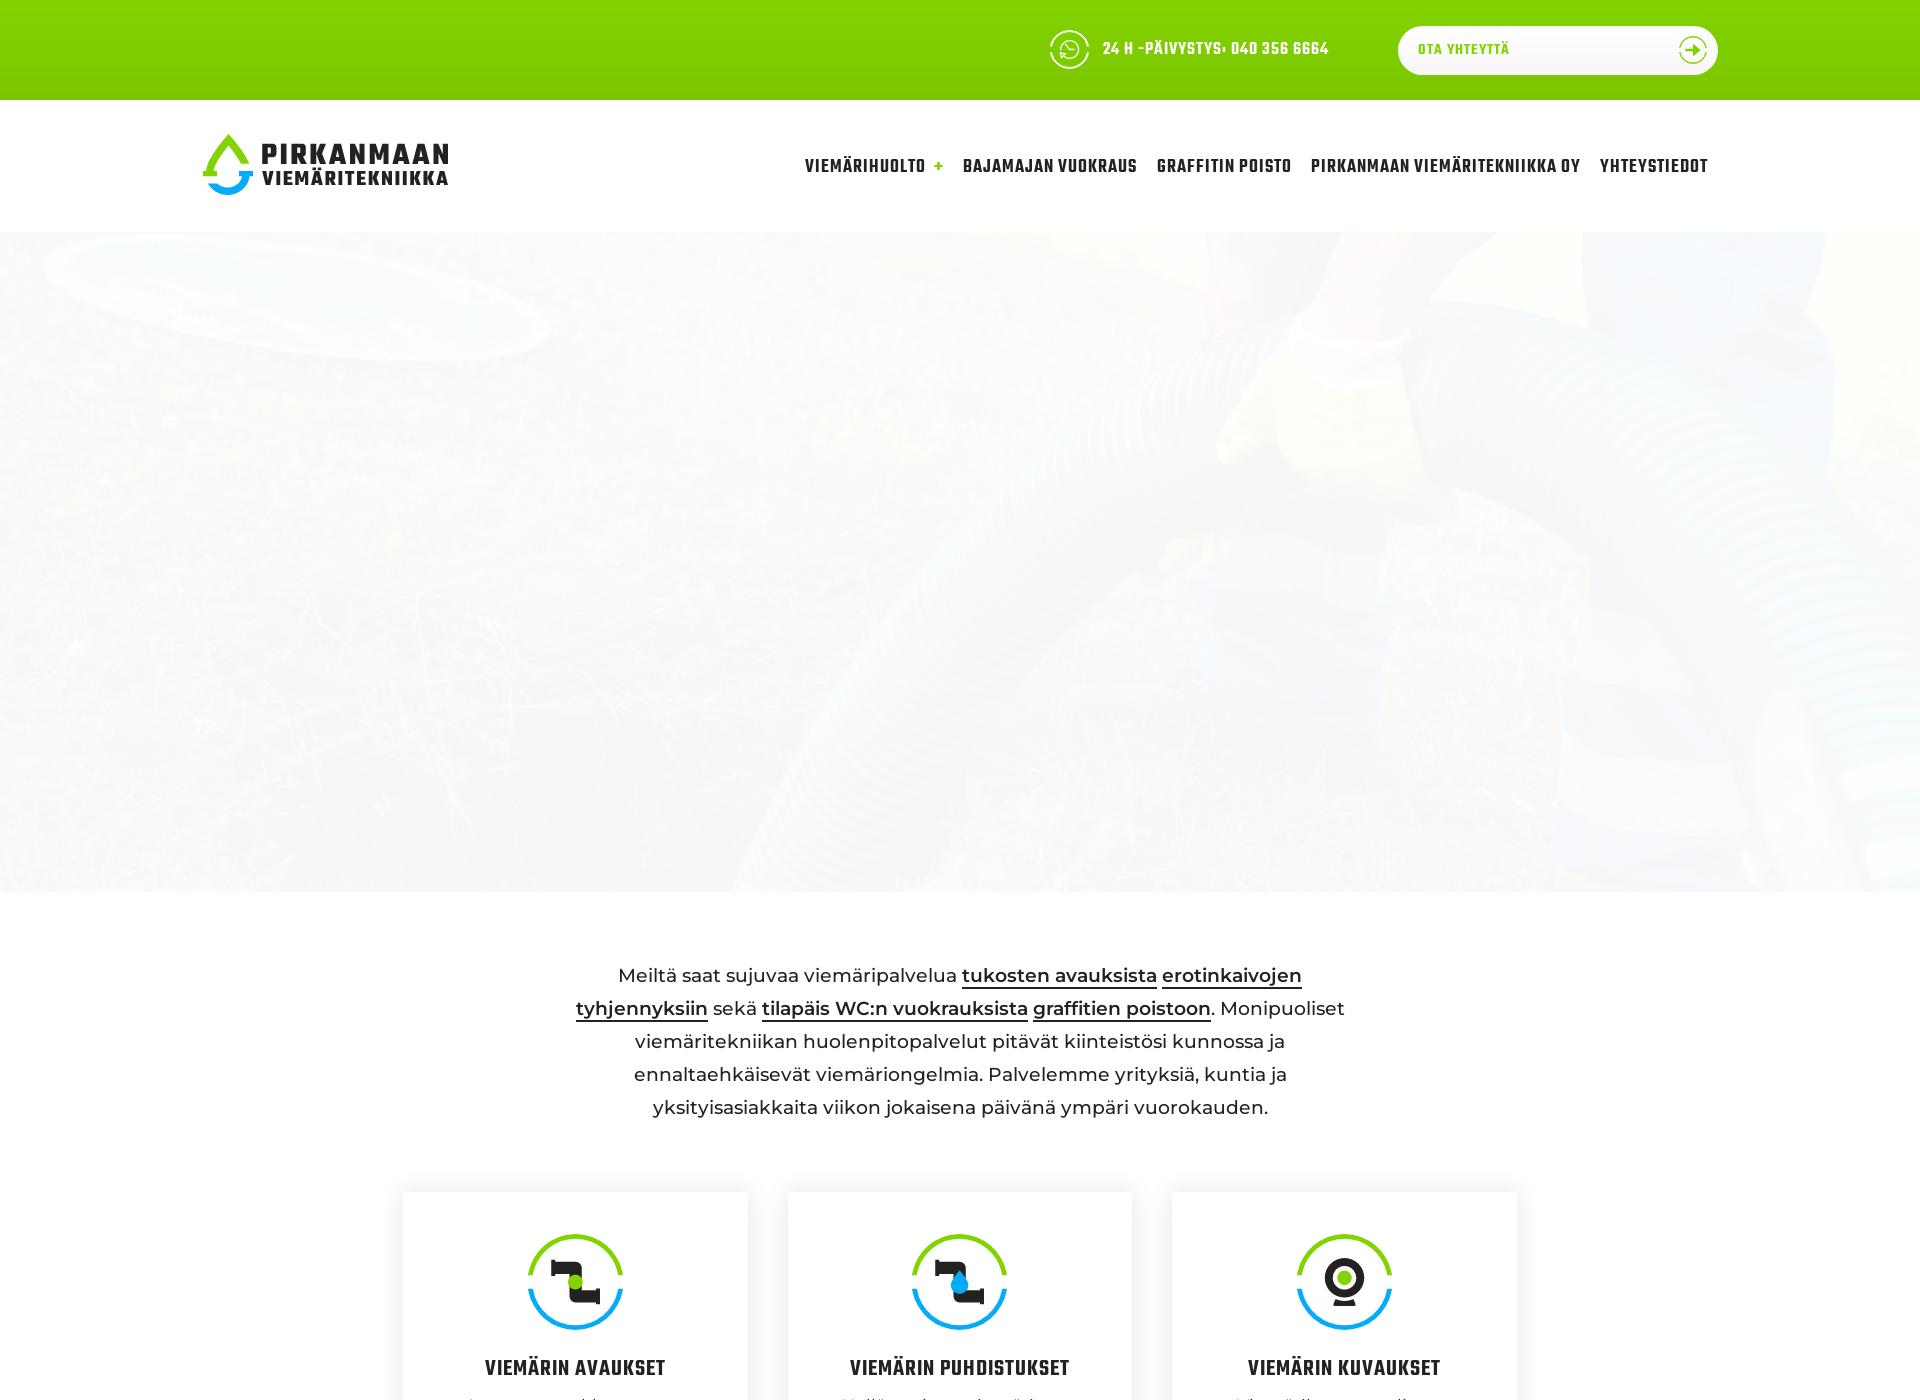 Screenshot for pirkanmaanviemaritekniikka.fi